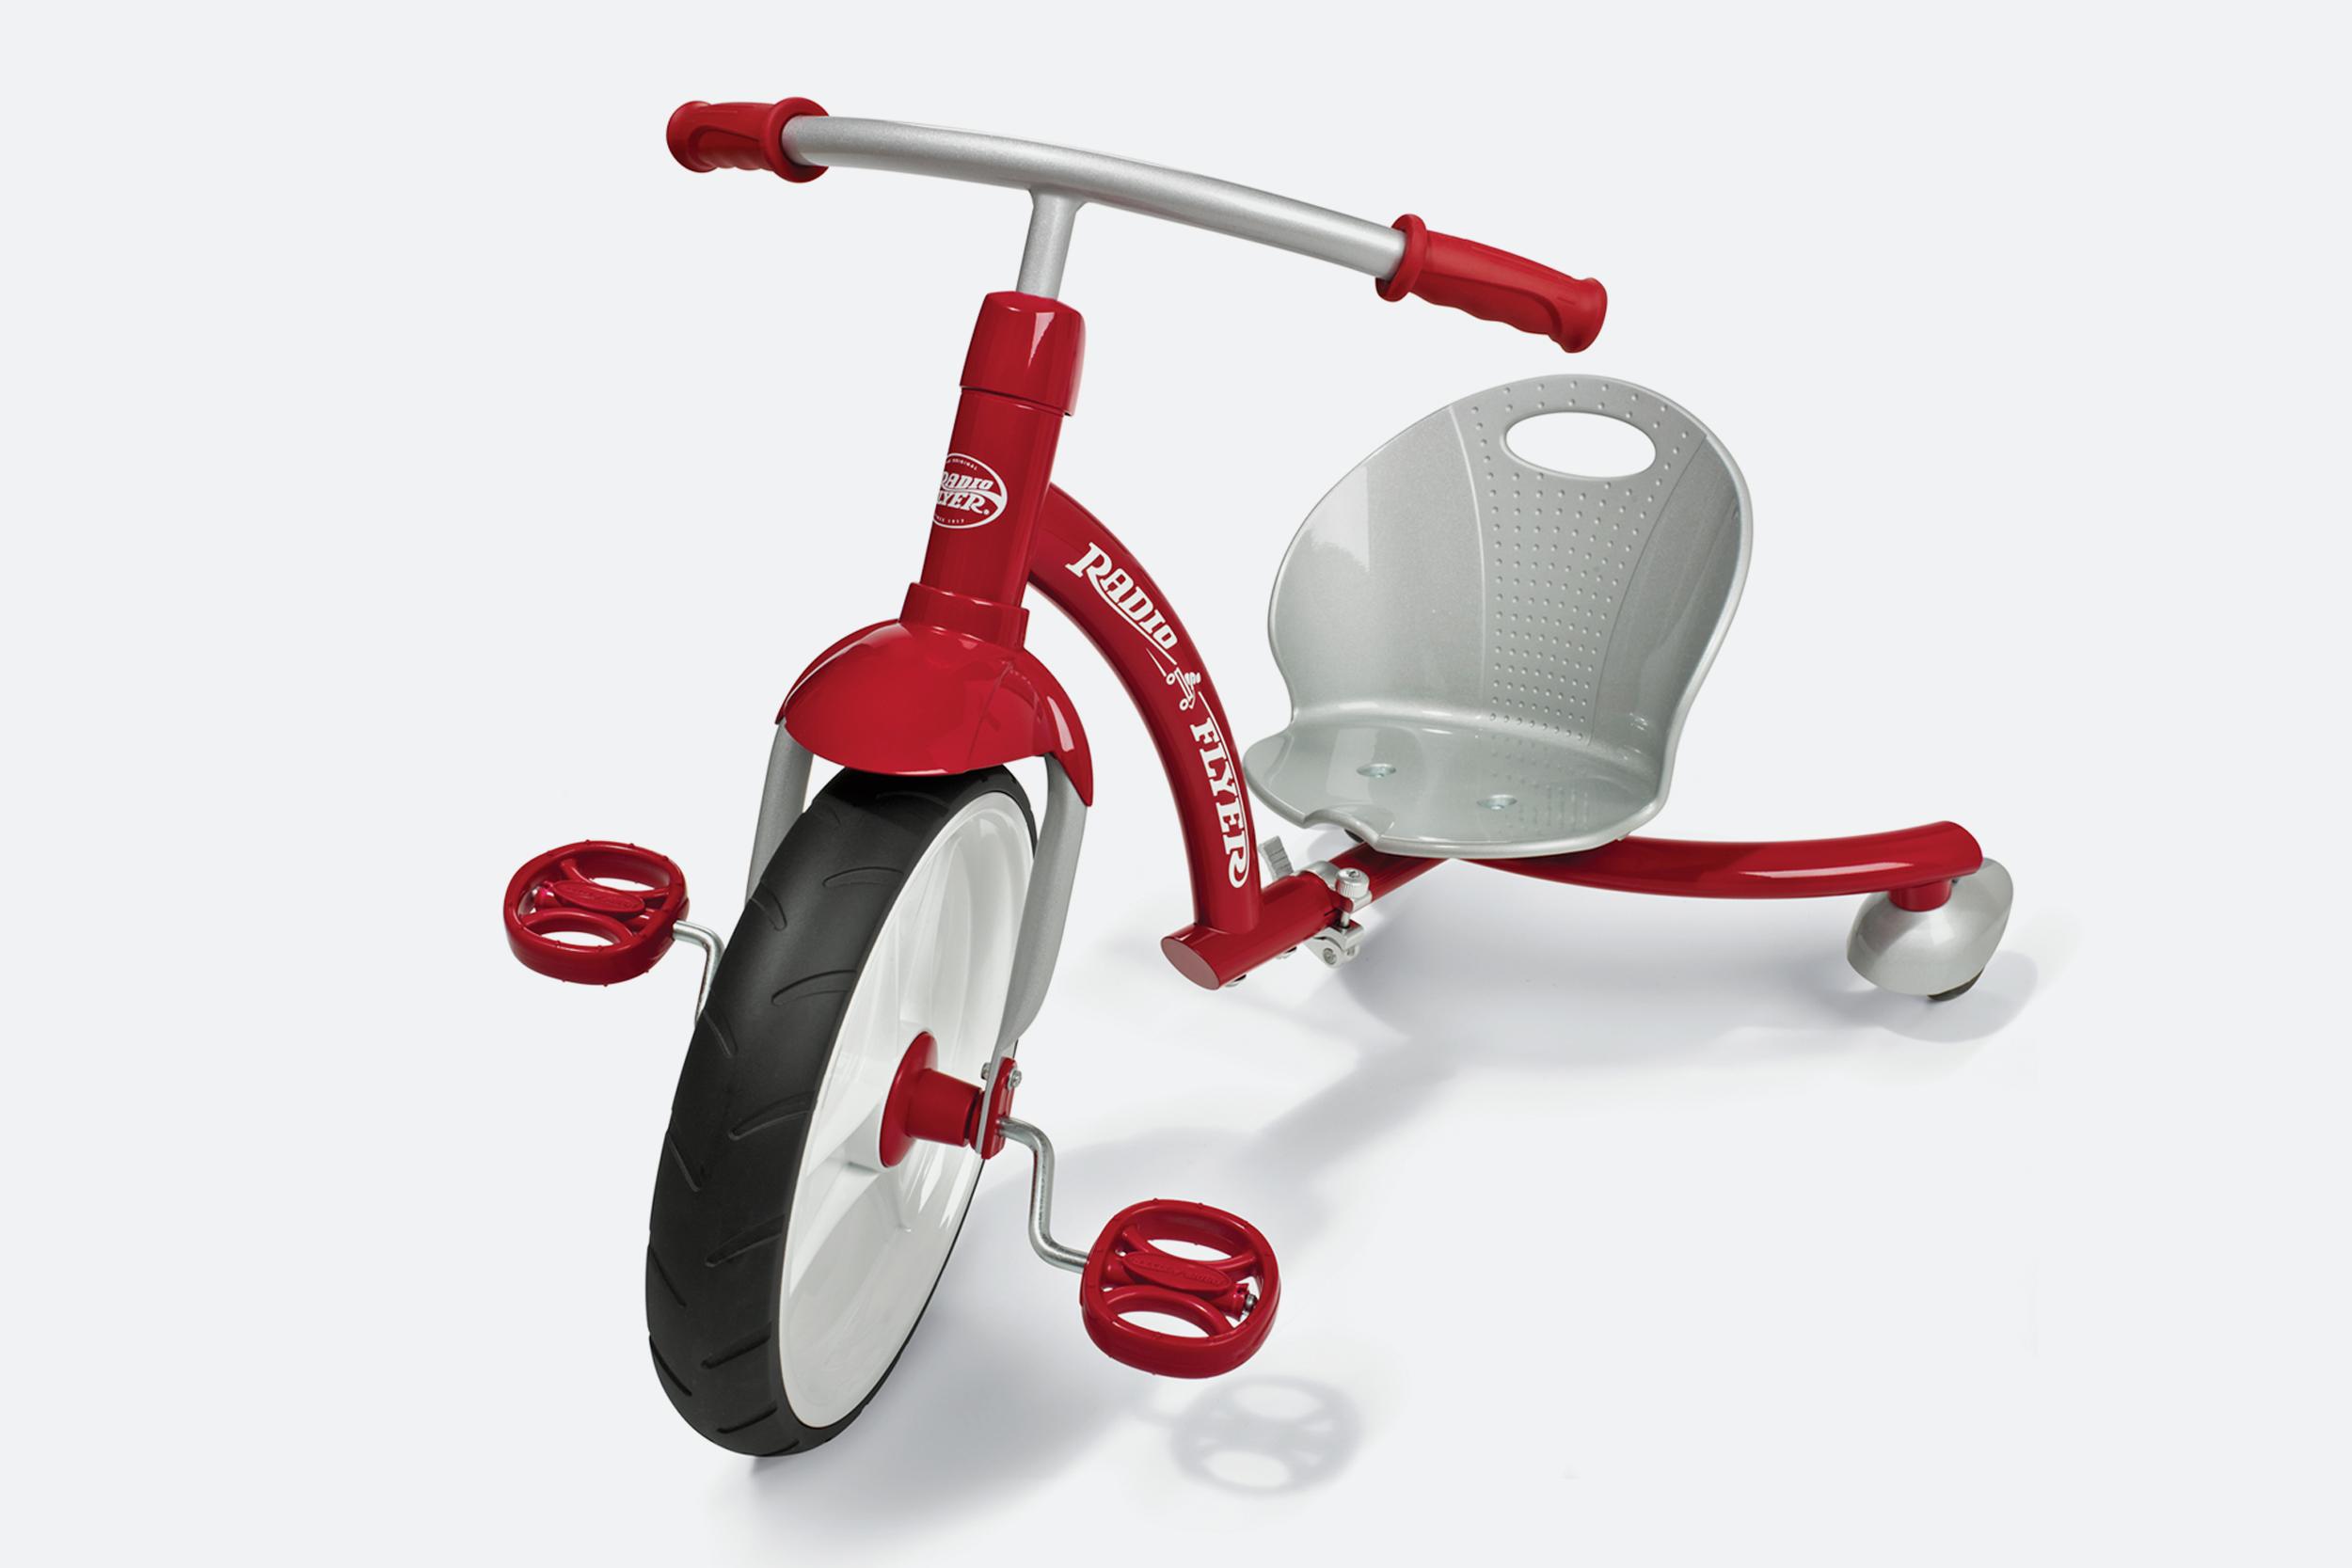 Radio Flyer Slider Rider  |  Product Configuration Design